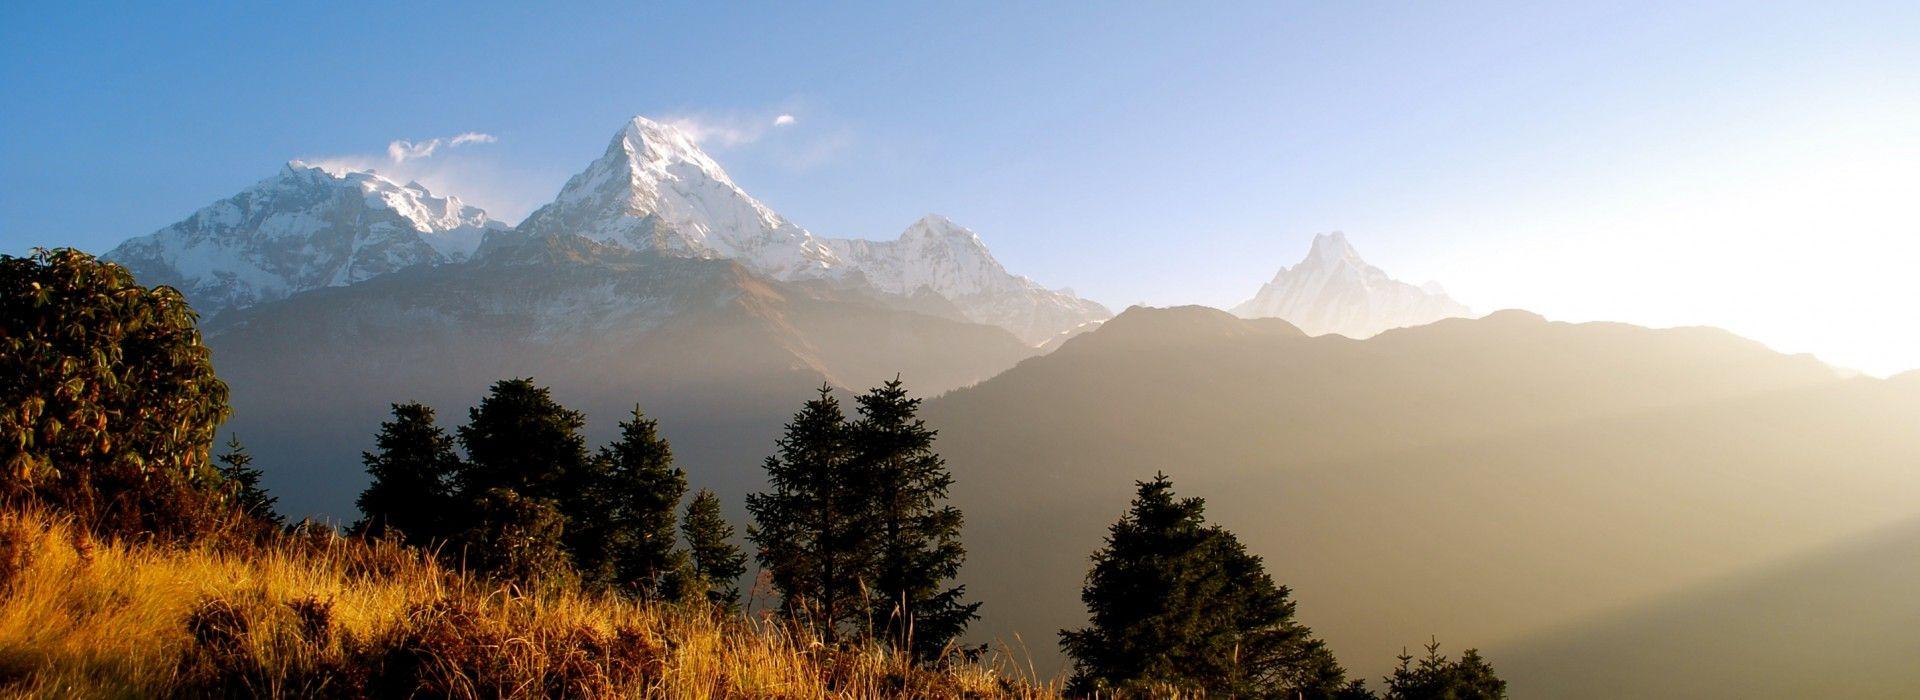 Adventure and sport activities Tours in Annapurna Circuit trek